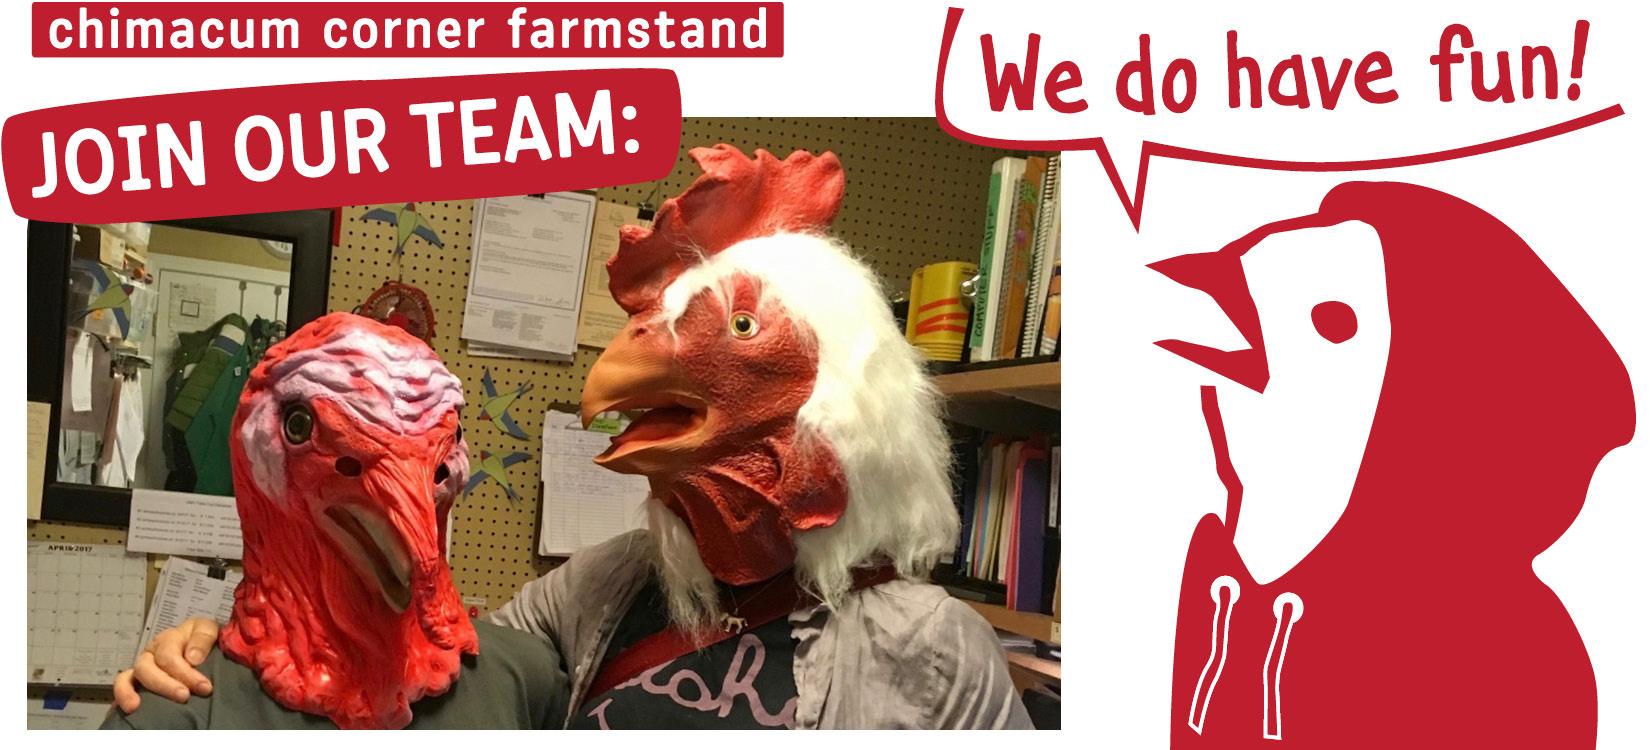 join-our-team-cartoon-chimacum-corner-farmstand.jpg